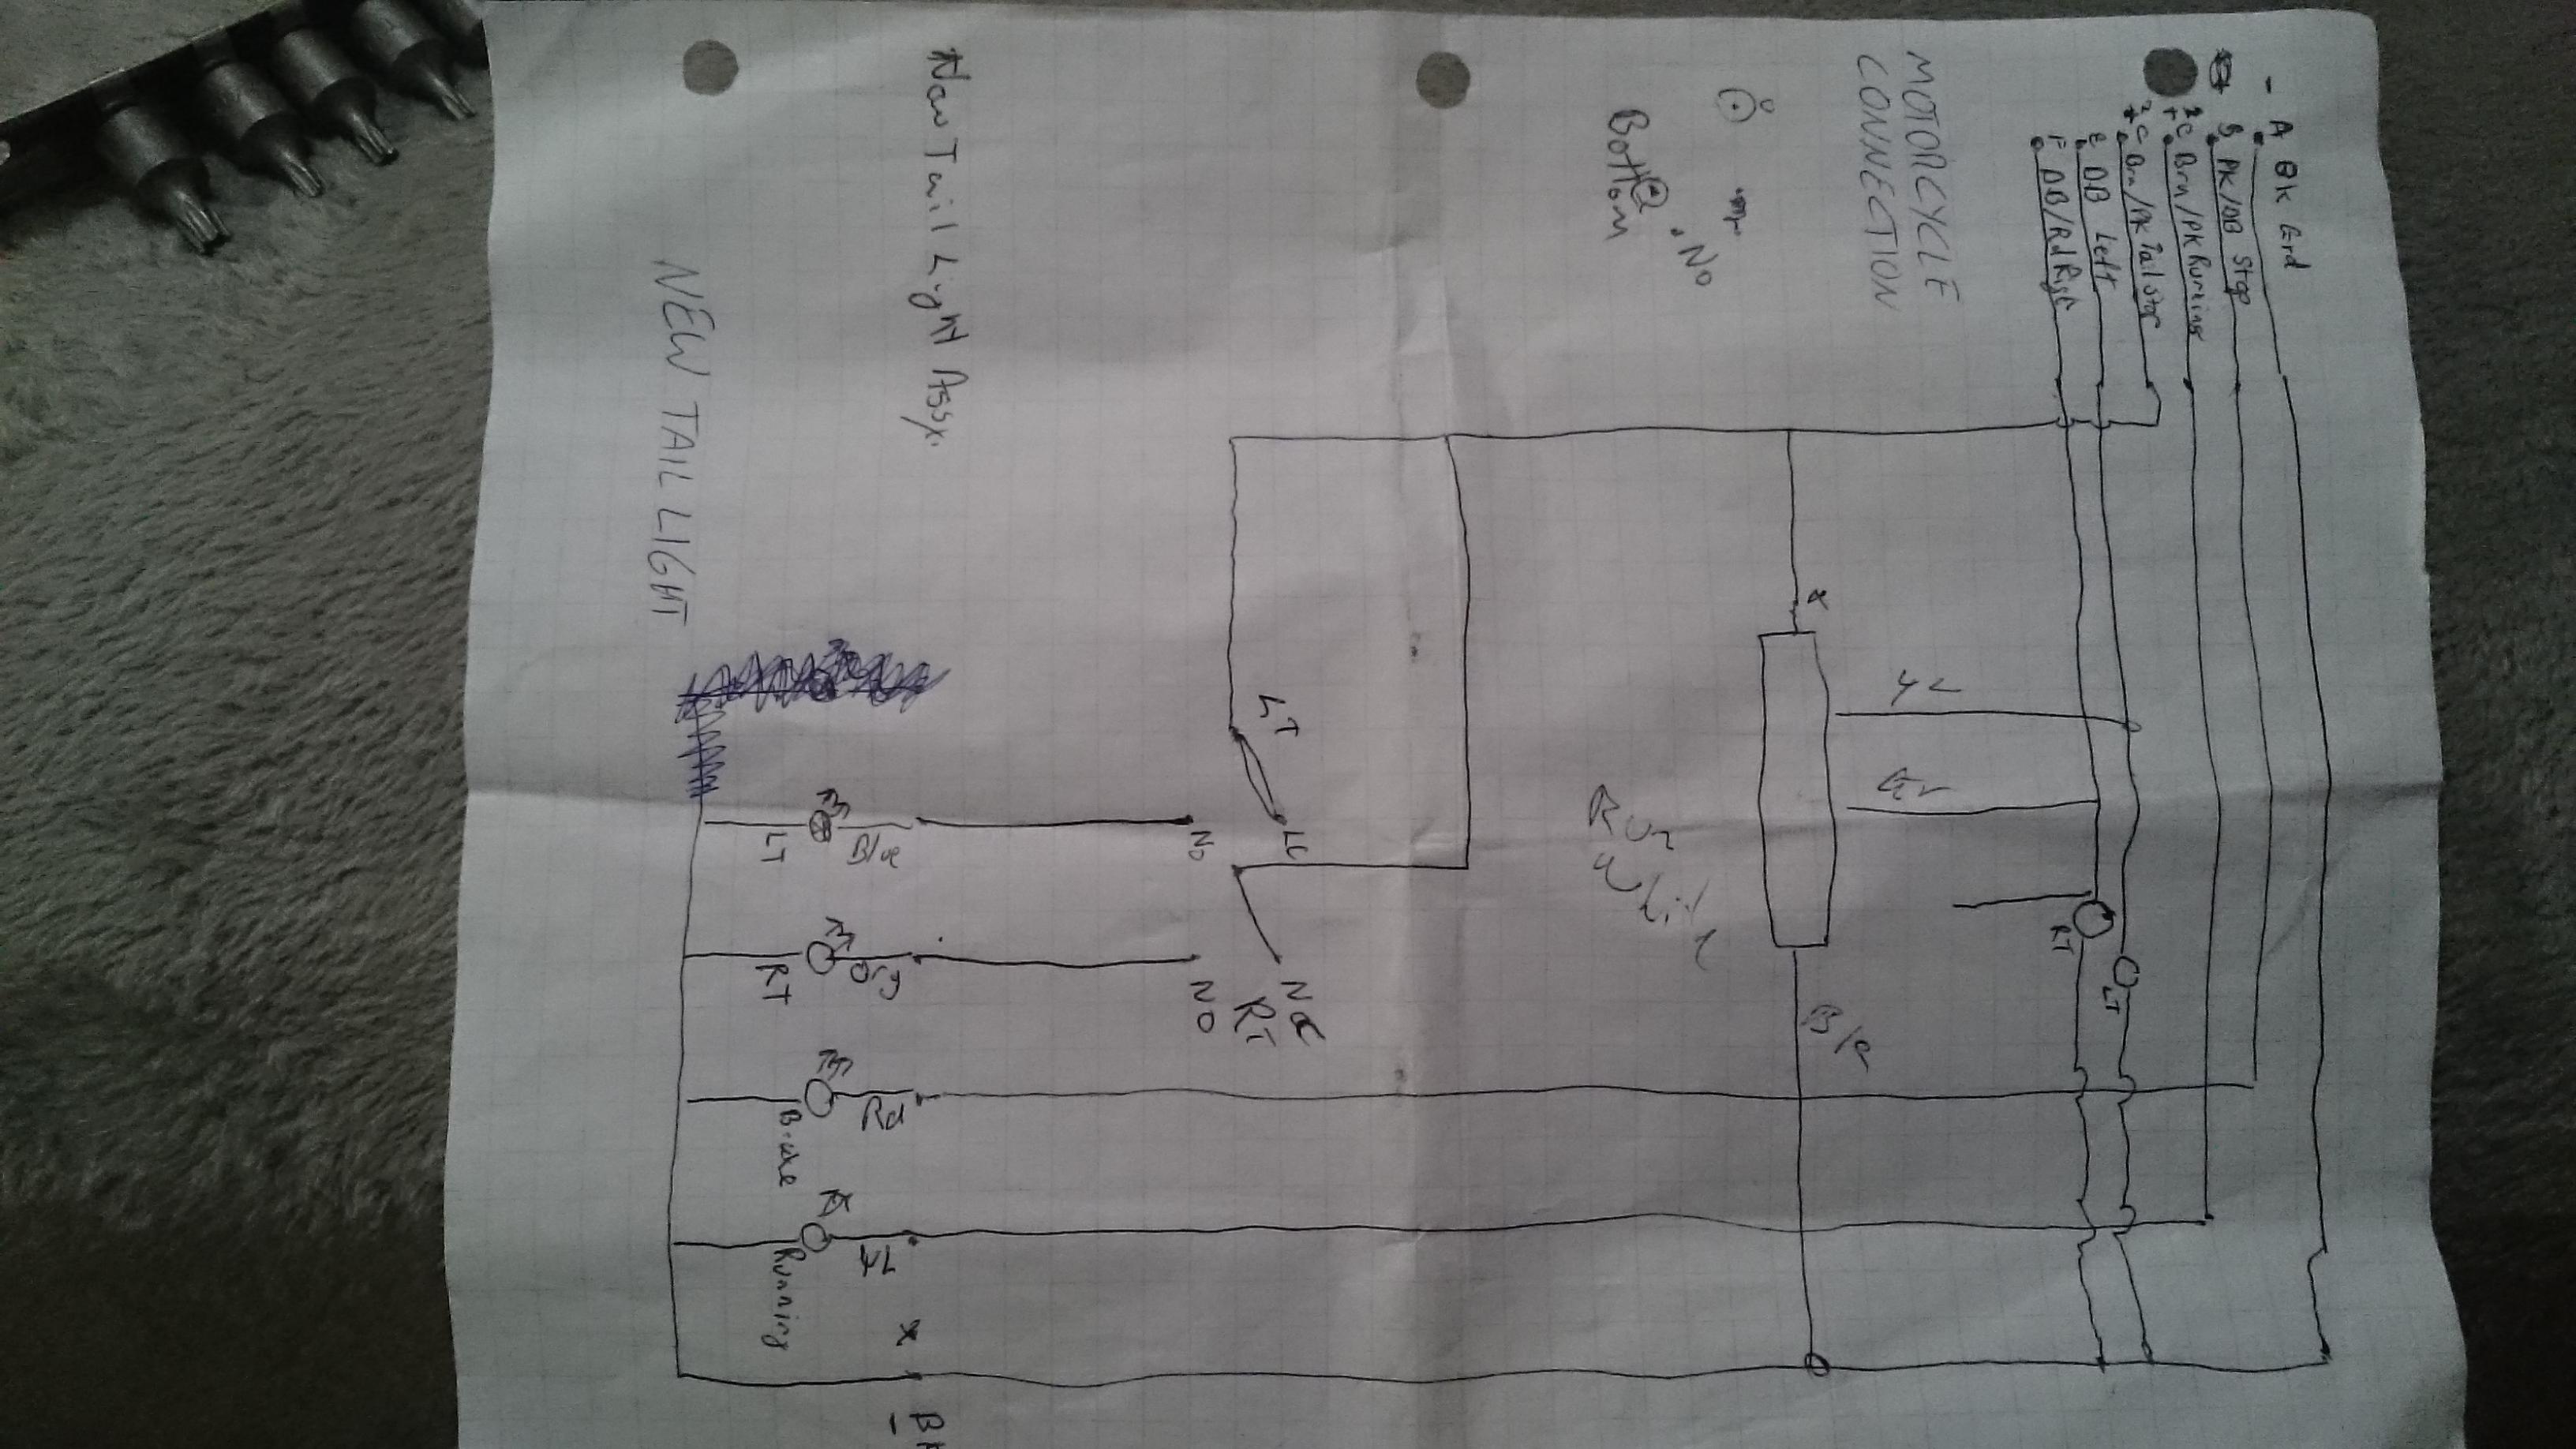 Ho to connect LED strip ke running turn signal lights ... Kawasaki Ninja Tail Light Wiring Diagram on motorcycle wiring diagrams, harley wiring diagrams, triumph wiring diagrams, ford truck wiring diagrams, ktm wiring diagrams, kawasaki wiring schematics, scooter wiring diagrams, subaru wiring diagrams, ferrari wiring diagrams, kawasaki vulcan 1500 wiring diagram, jeep wiring diagrams, yamaha wiring diagrams, kawasaki prairie 360 wiring-diagram, honda wiring diagrams, kawasaki vulcan 900 wiring diagram, piaggio wiring diagrams, mitsubishi pajero wiring diagrams, nissan wiring diagrams, chopper wiring diagrams, bmw wiring diagrams,